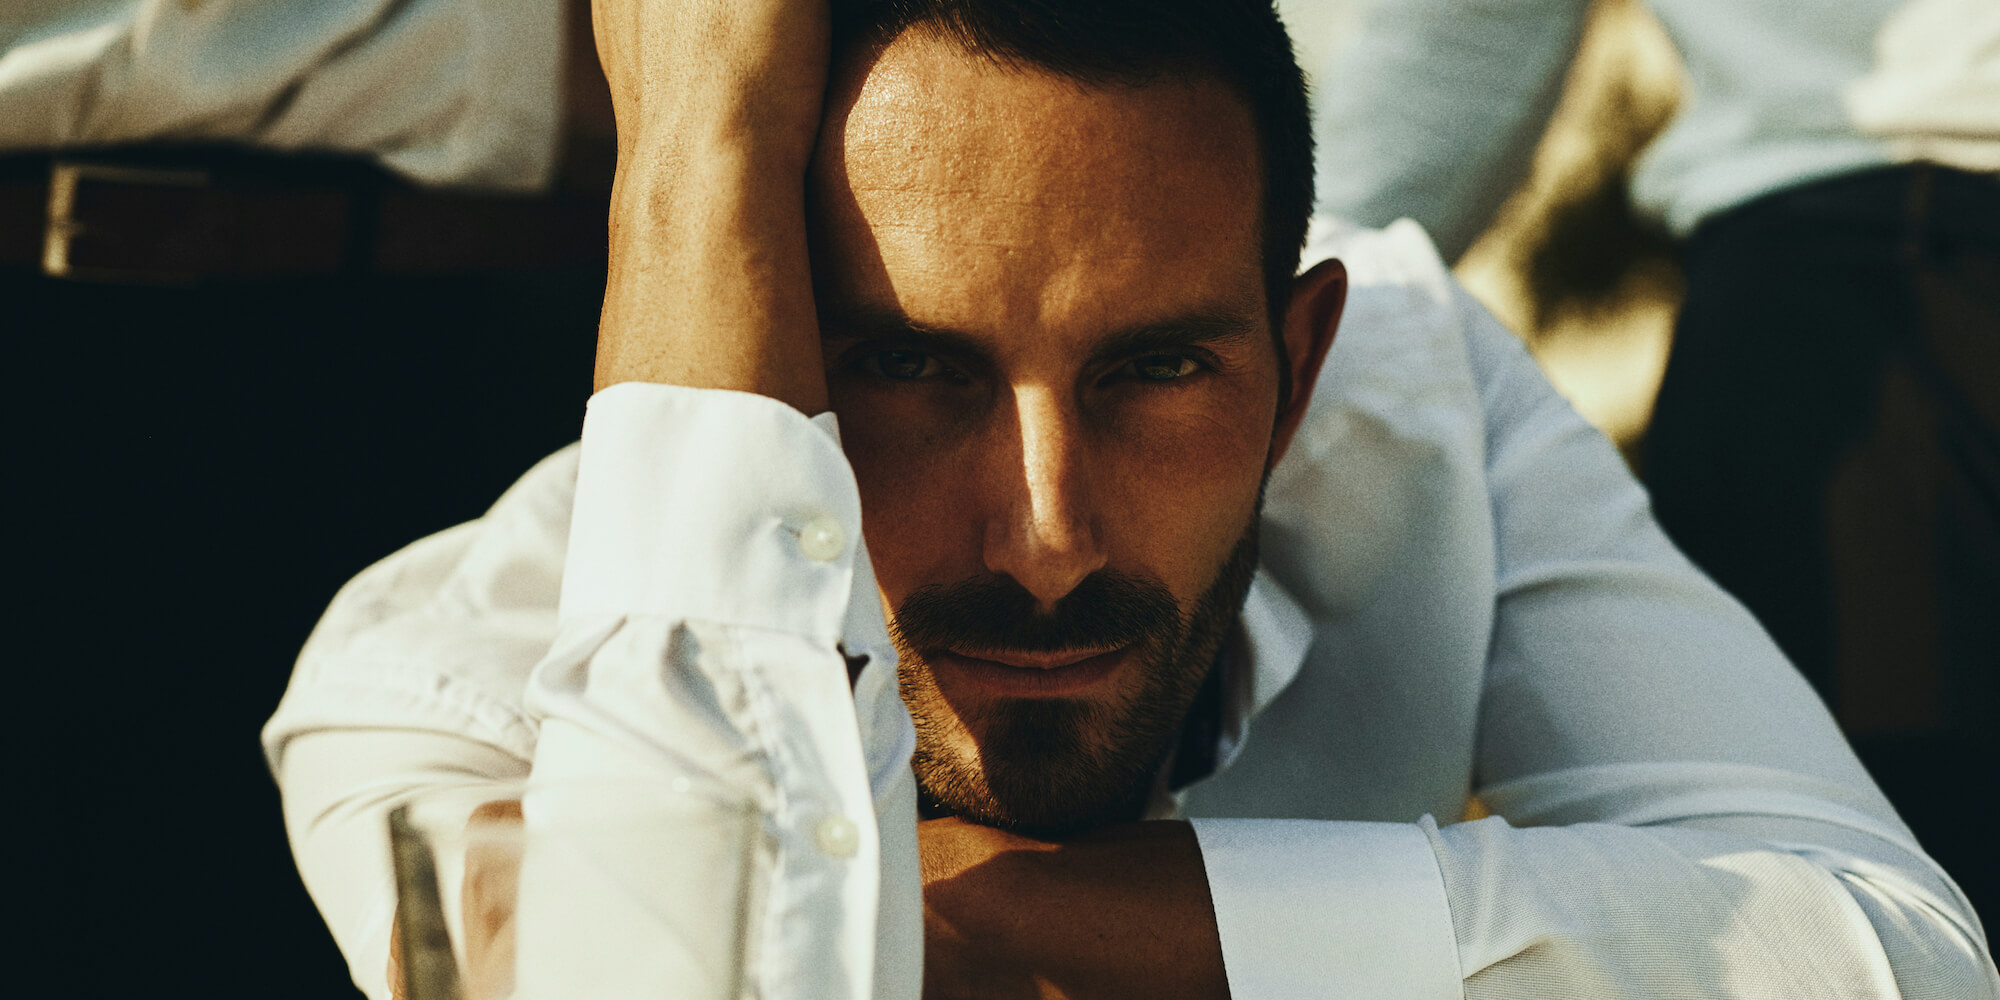 Portrait Series of Daniel Cati, color portrait of man in white shirt